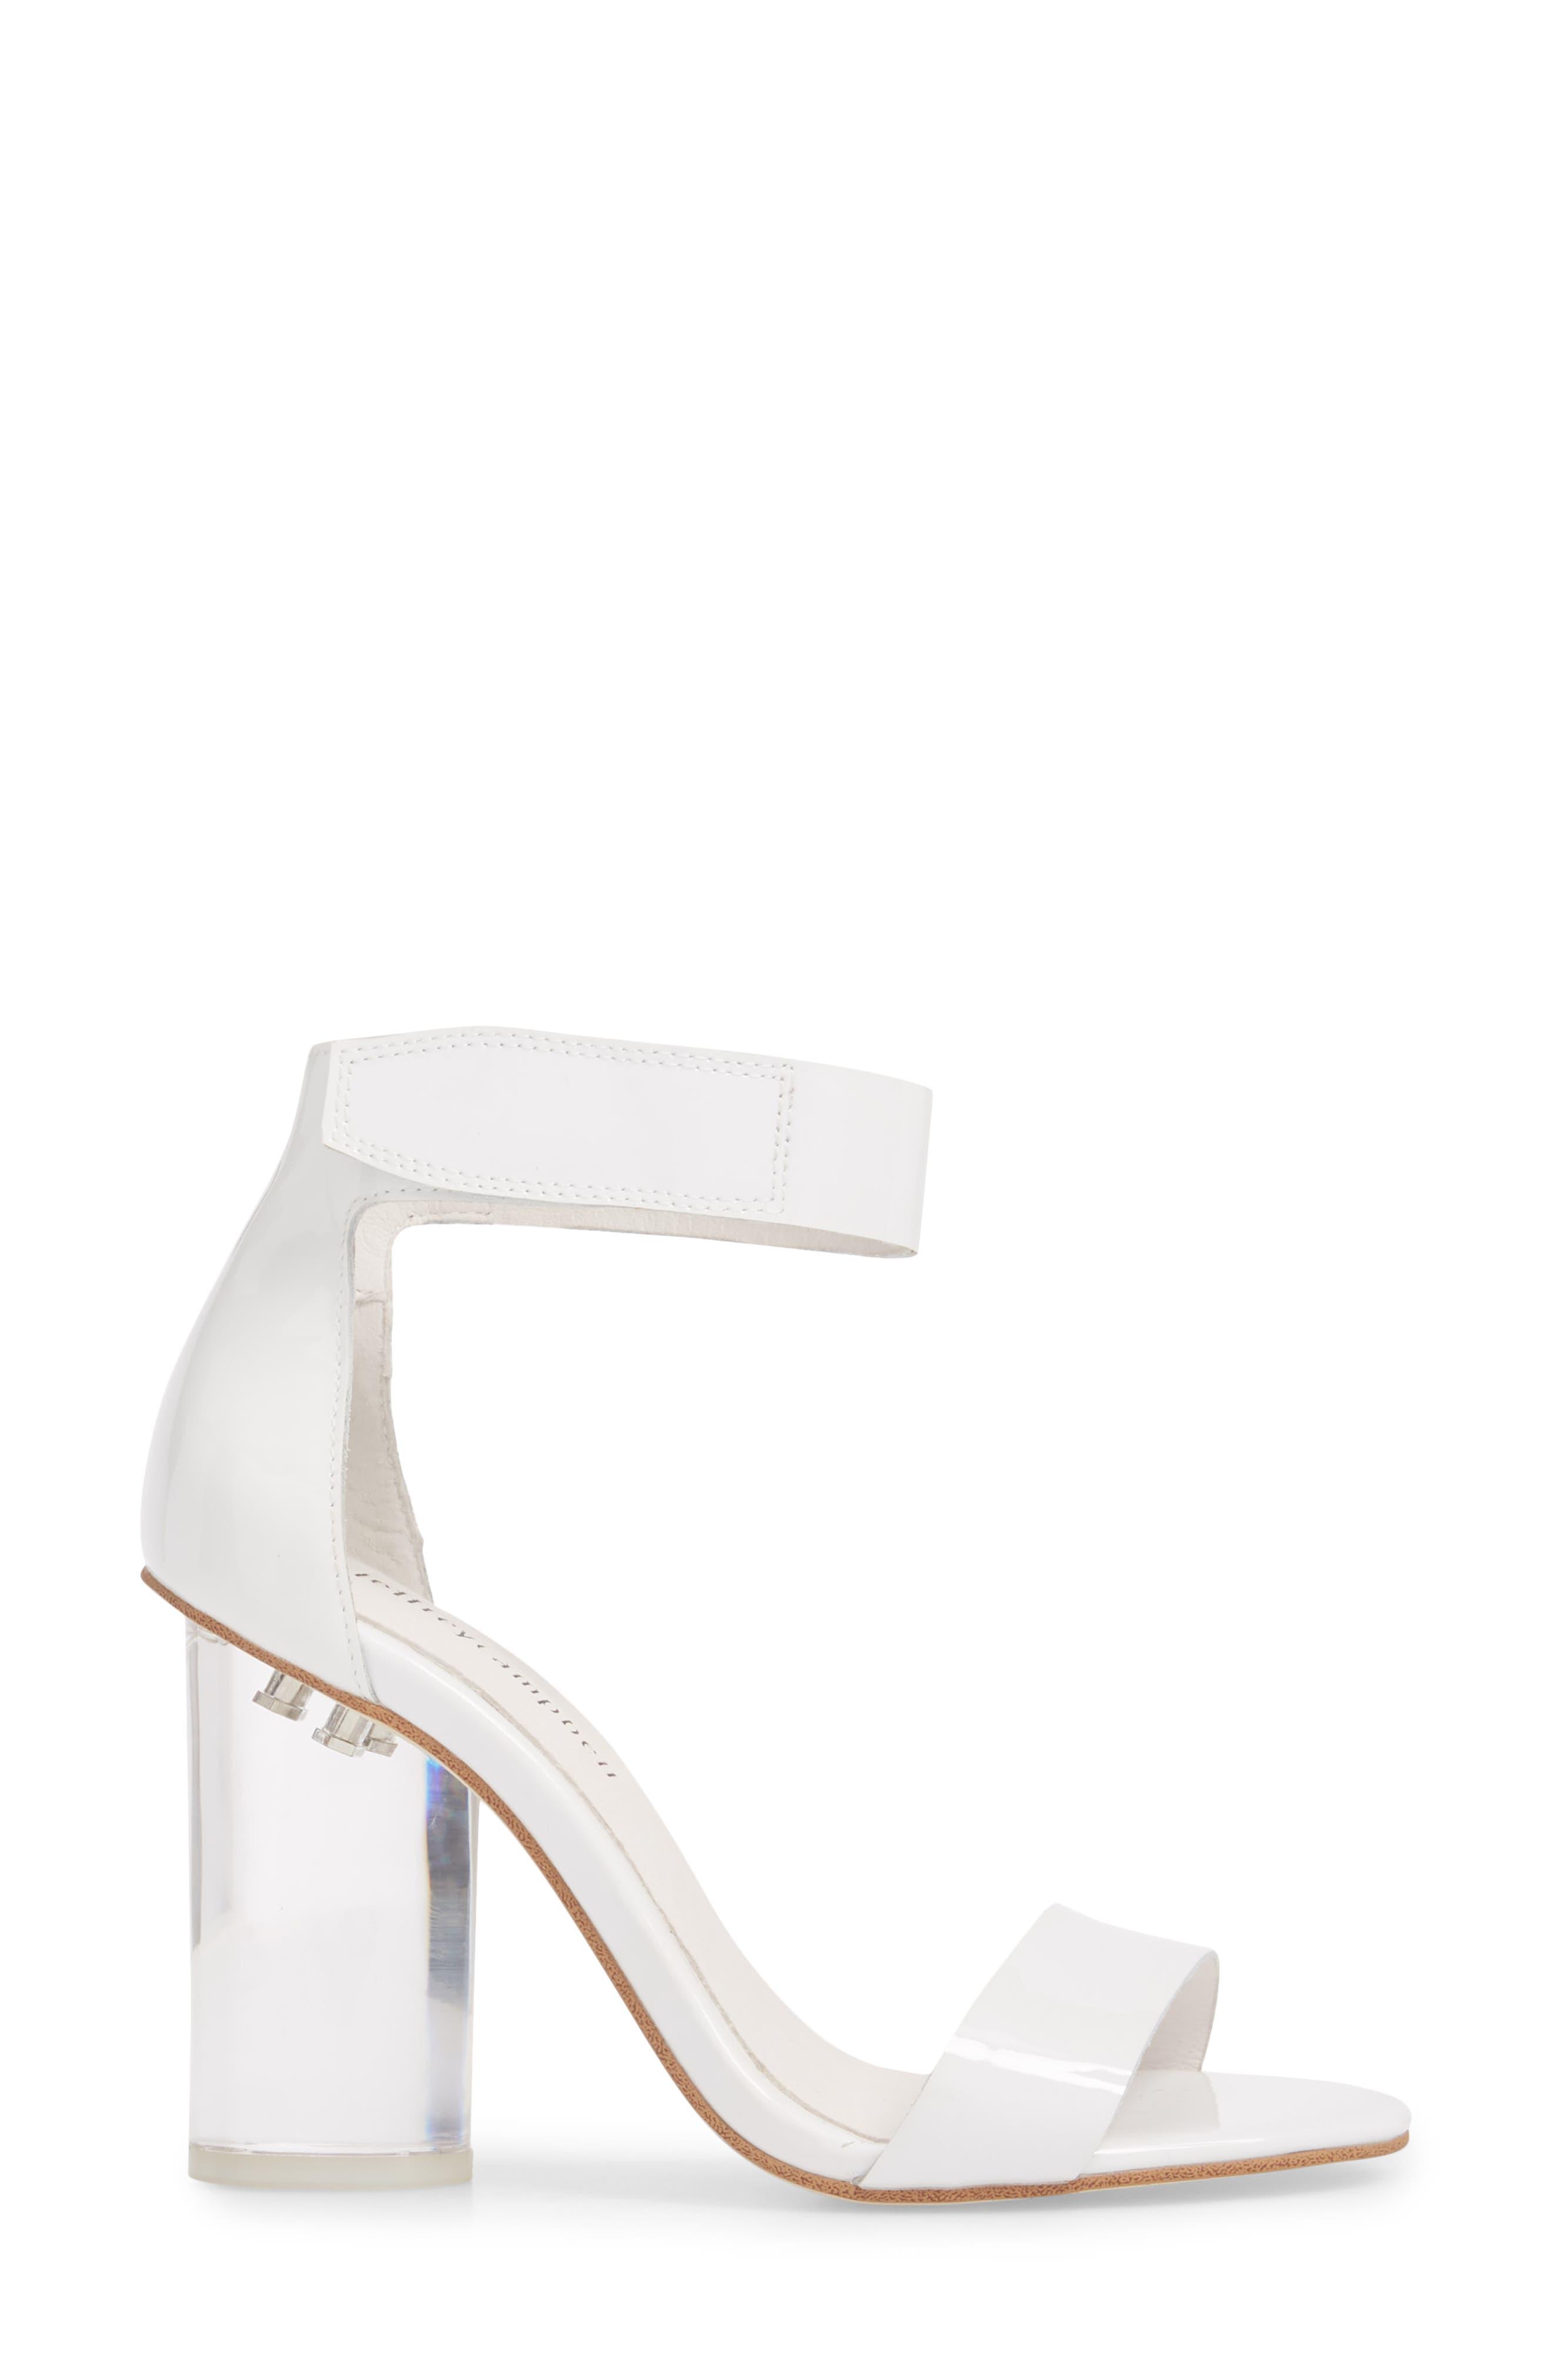 Alessa Clear Heel Sandal,                             Alternate thumbnail 3, color,                             White Patent